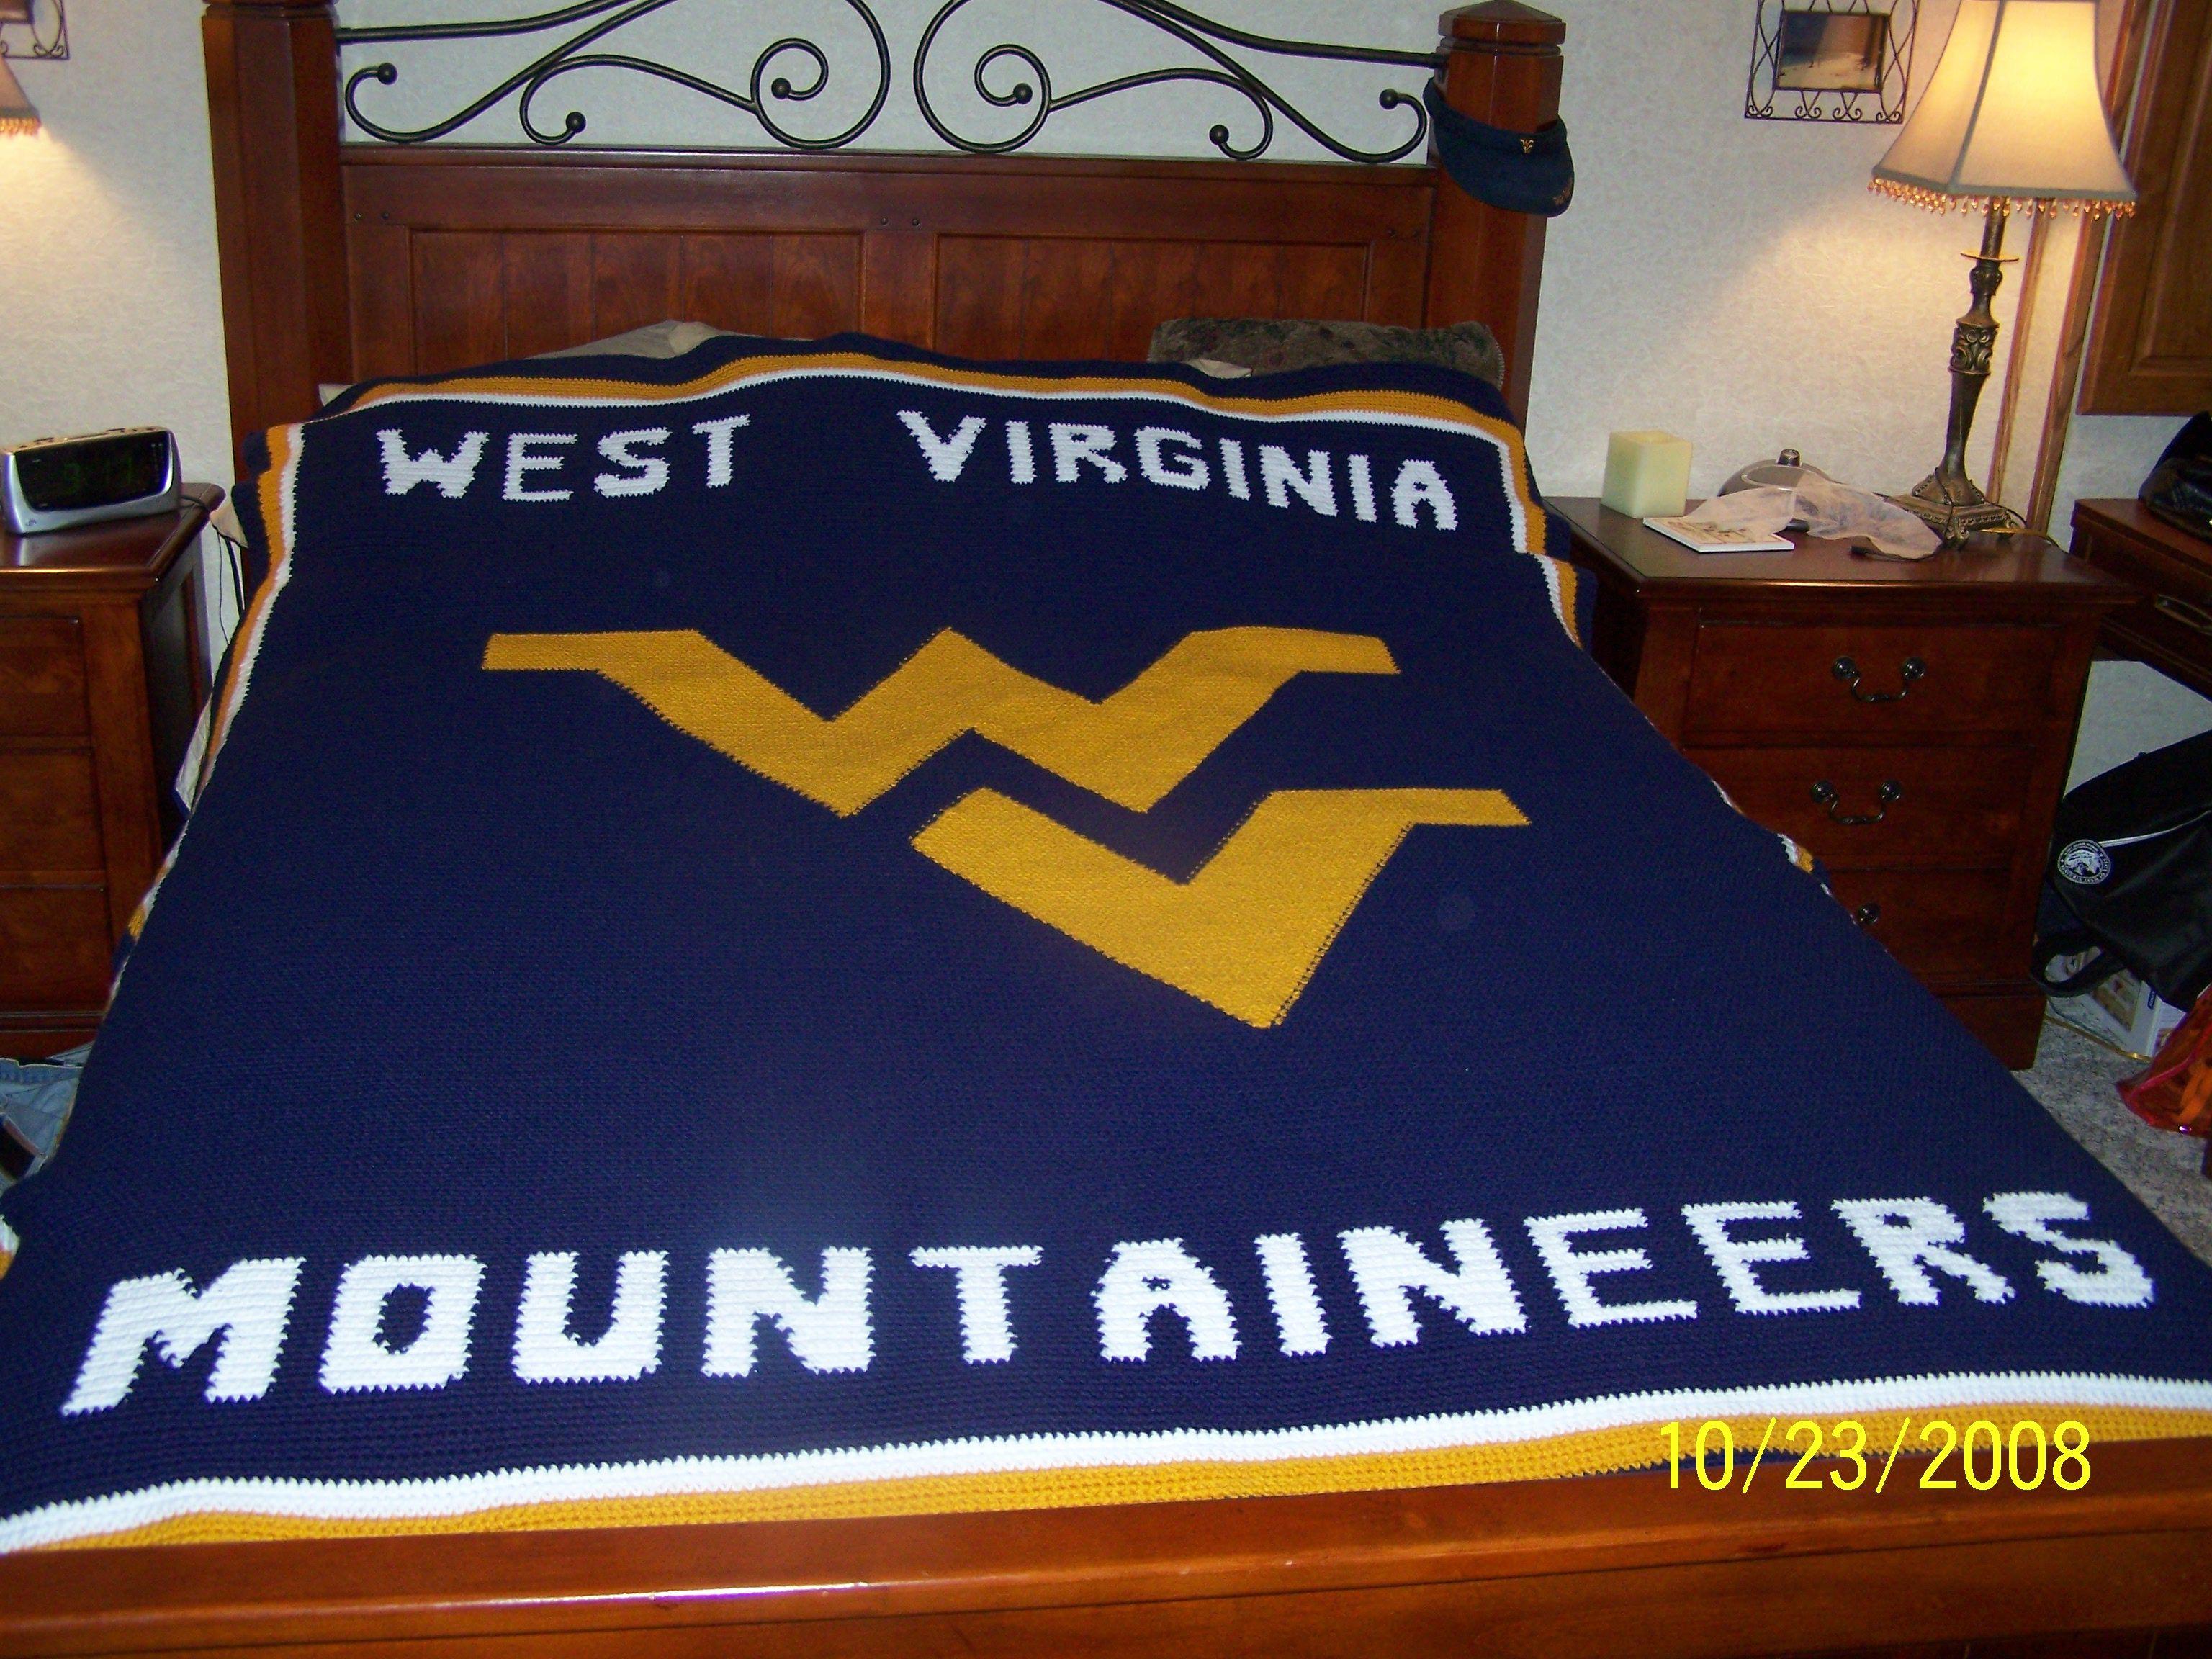 West Virginia University Wvu Blanket Go Mountaineers Crochet Patterns Crochet Afghan Crochet Projects